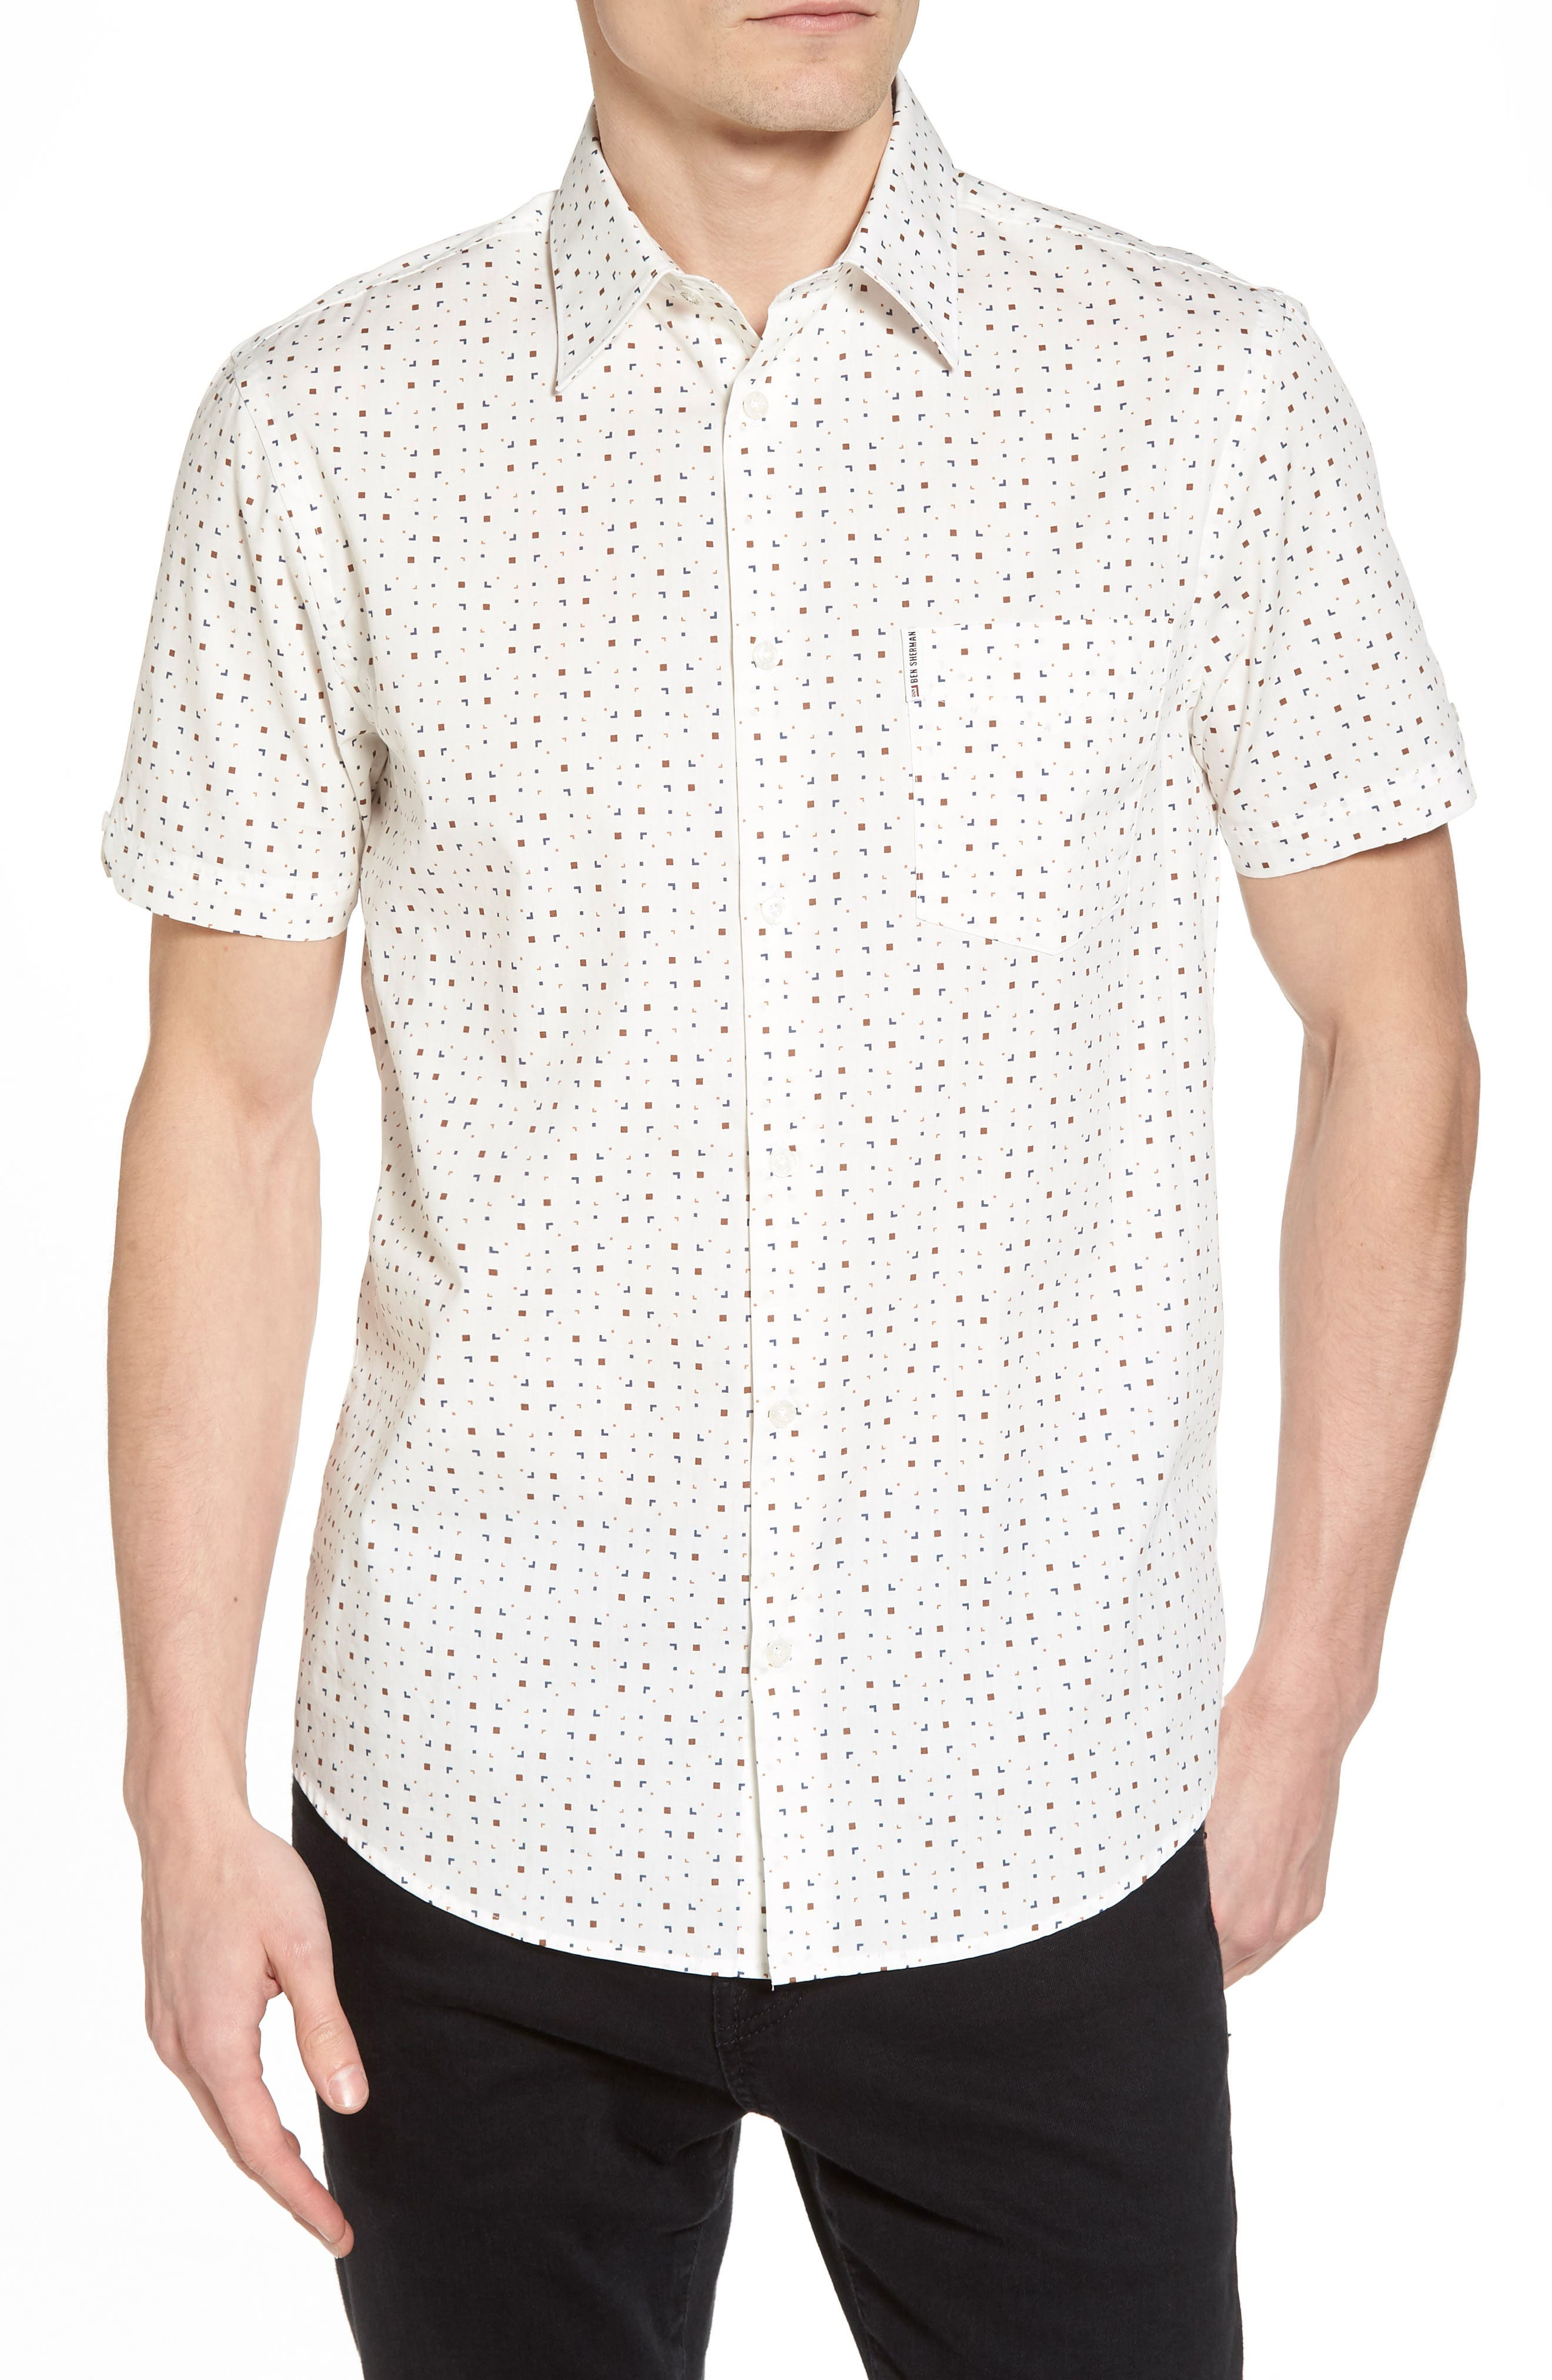 Main Image - Ben Sherman Scattered Geo Woven Shirt